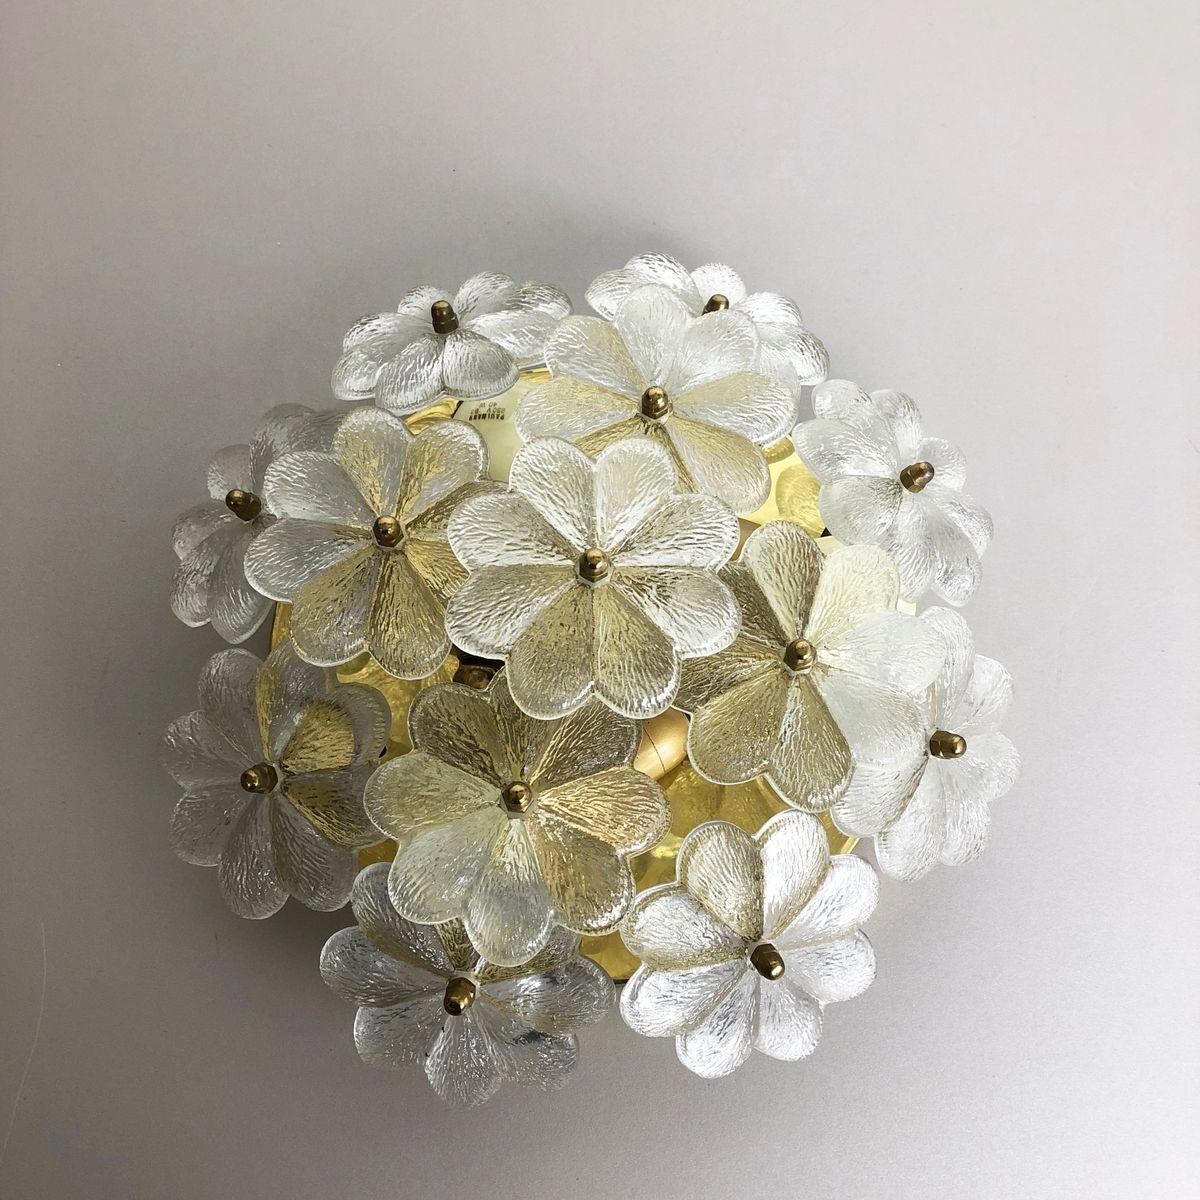 Große florale Wandlampe aus Glas & Messing von Ernst Palme, 1970er